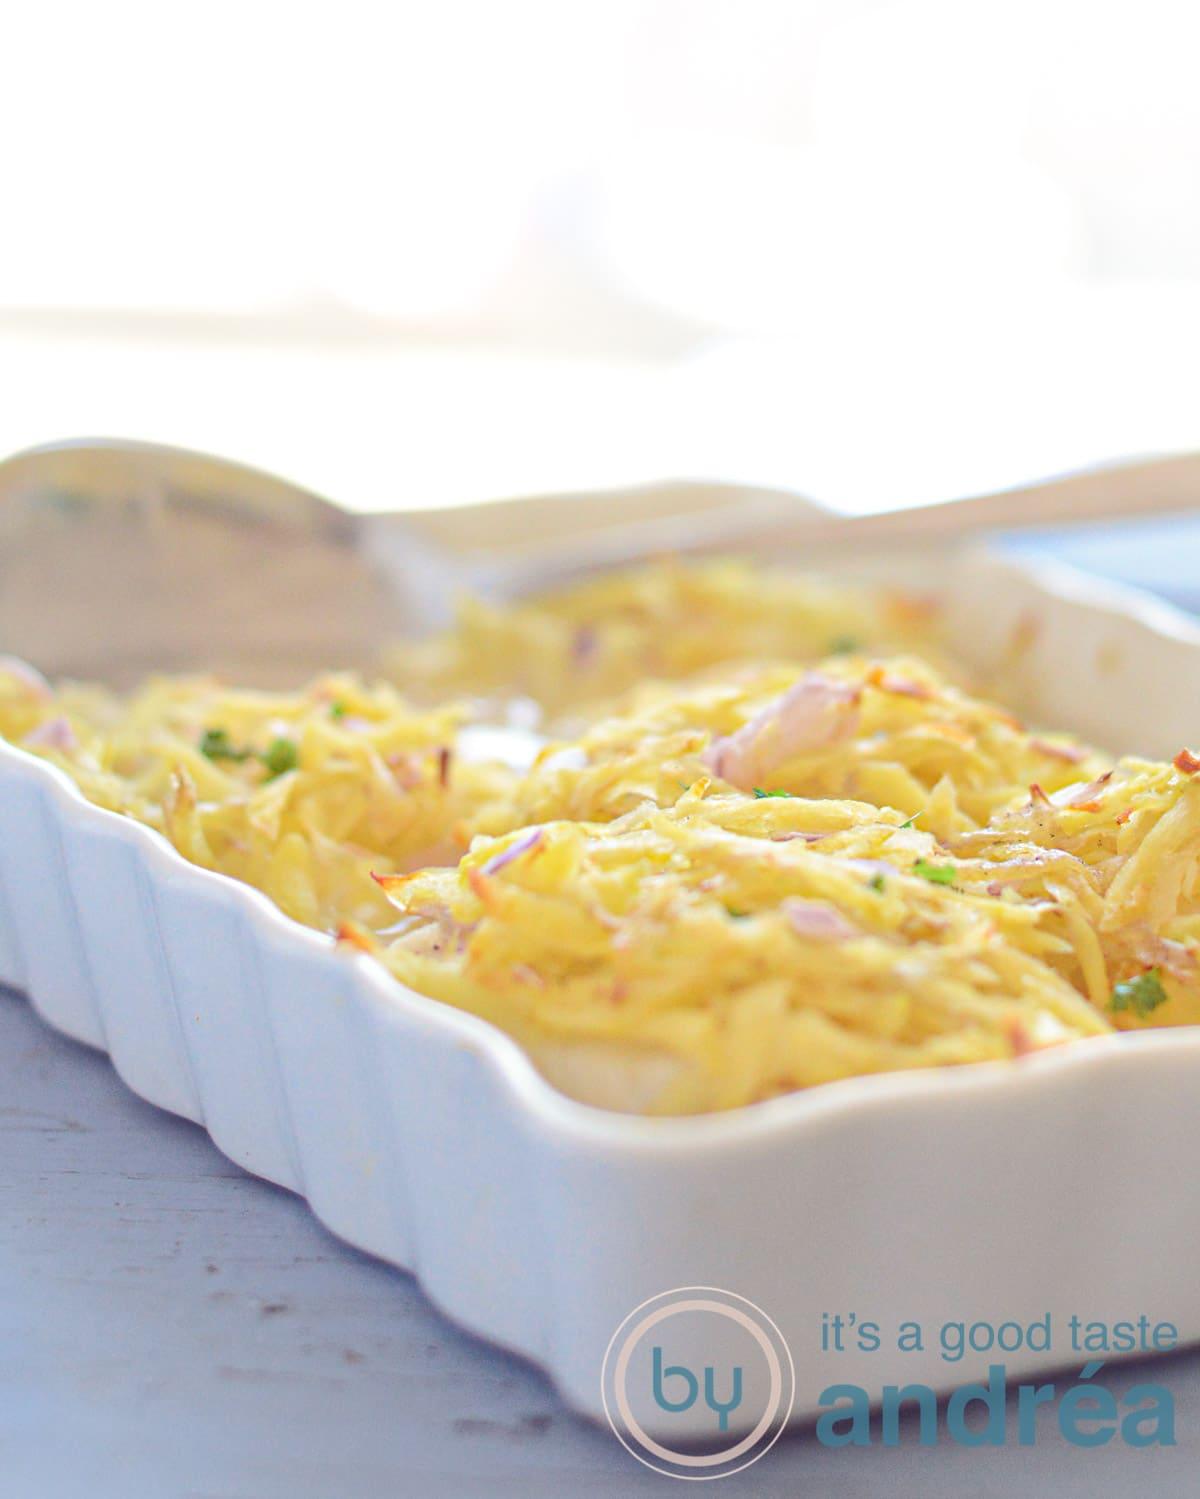 Kabeljauwfilet met aardappel rosti - cod filet with rosti-bewerkt